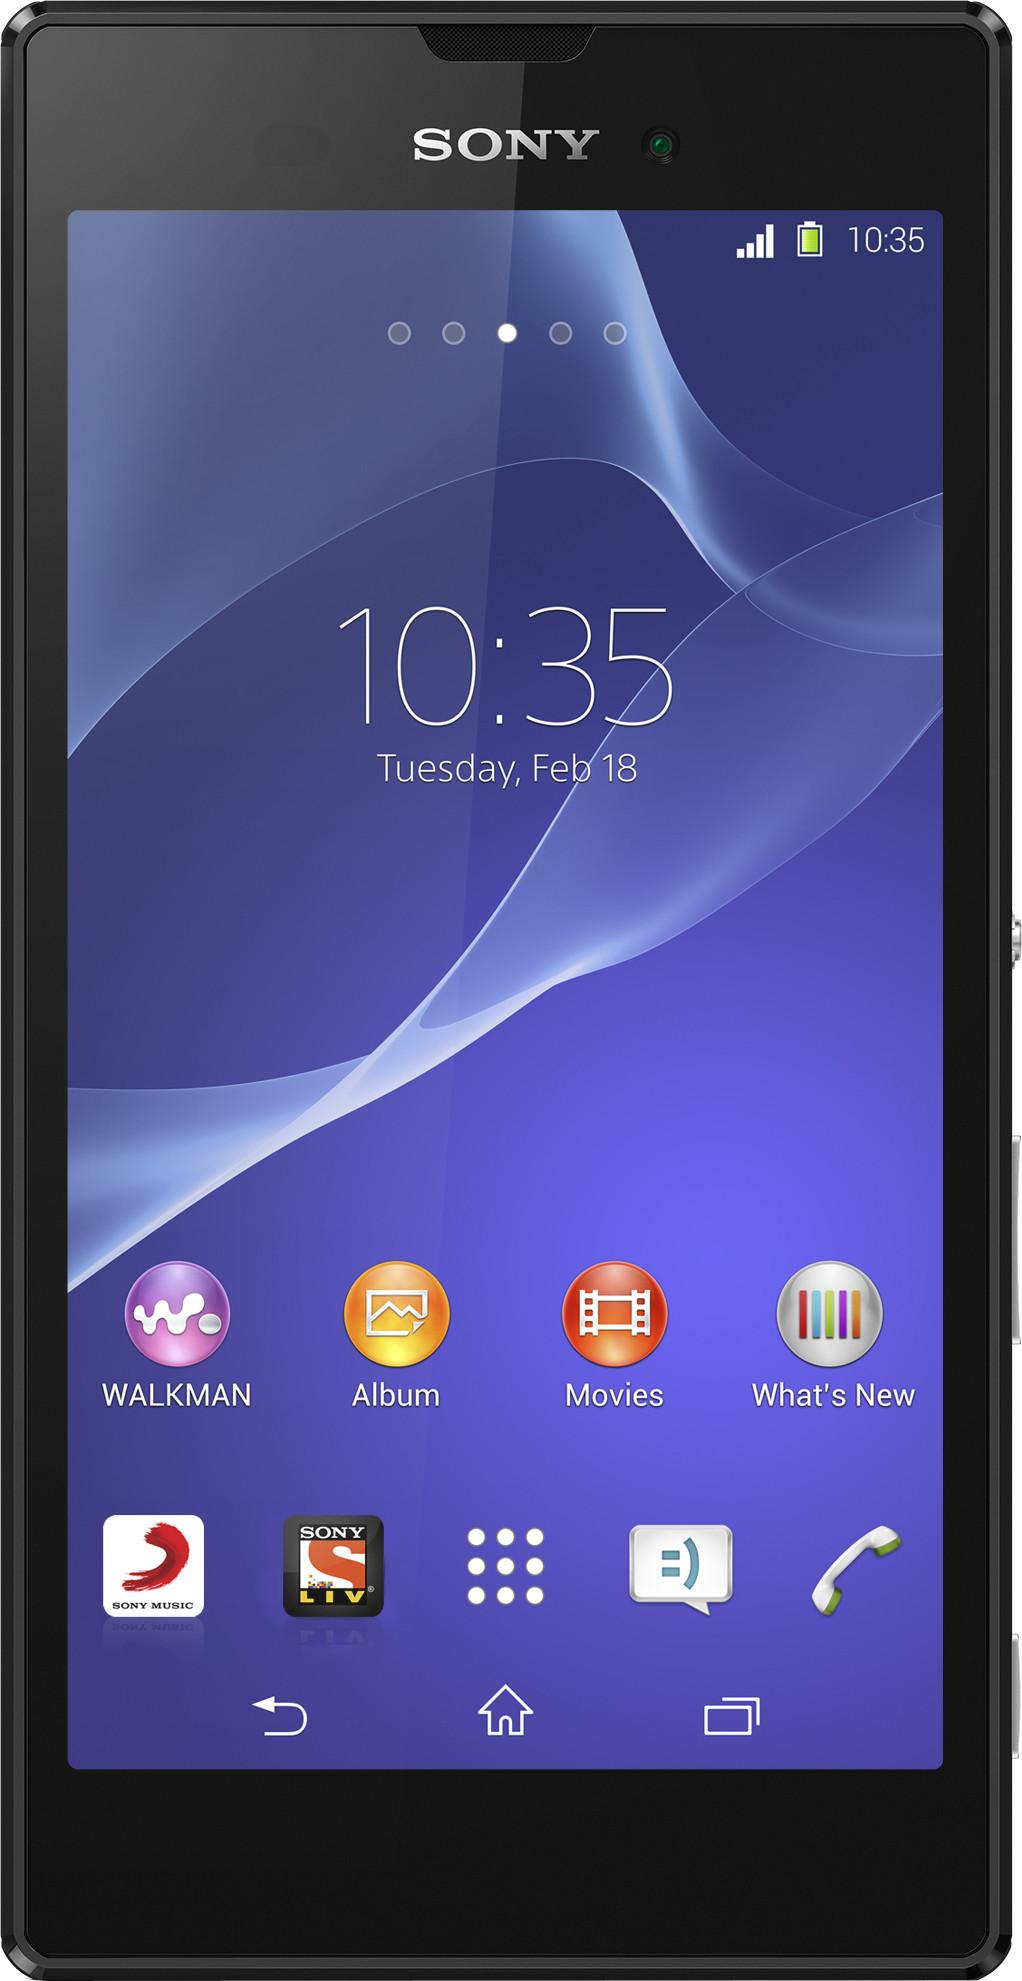 Sony Xperia T3 (1GB RAM, 8GB)